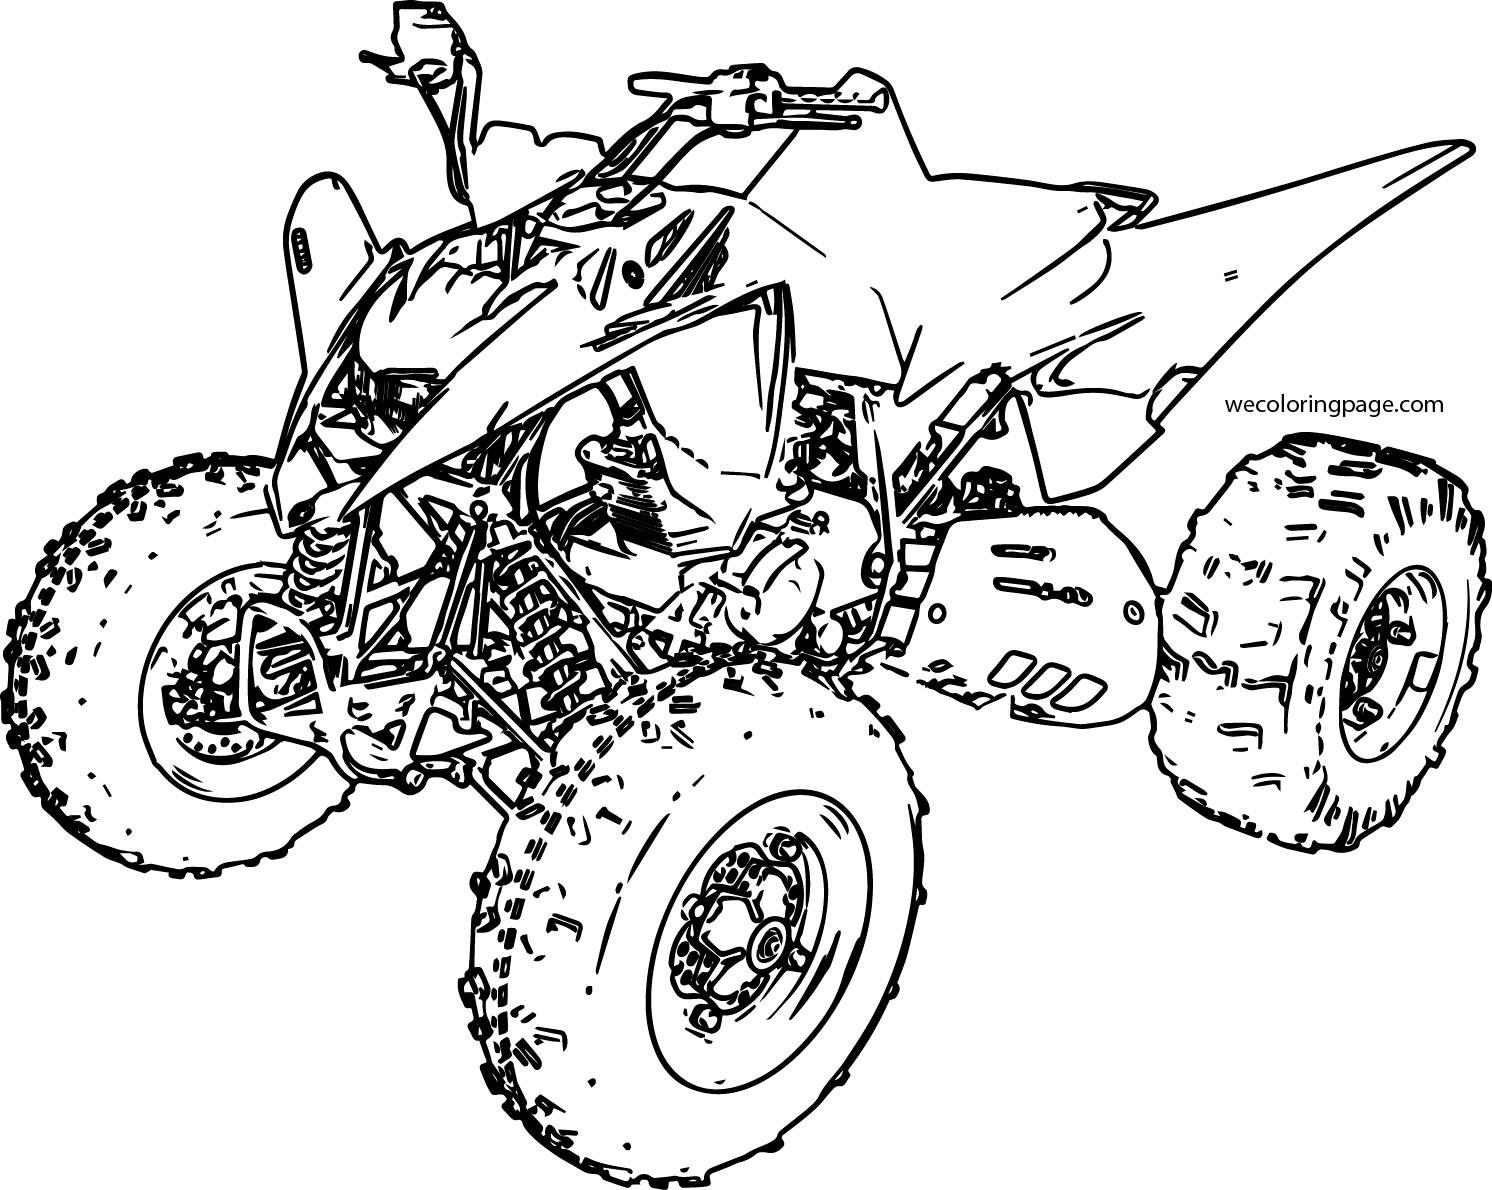 Sport Atv Yamaha Raptor Coloring Page Wecoloringpage